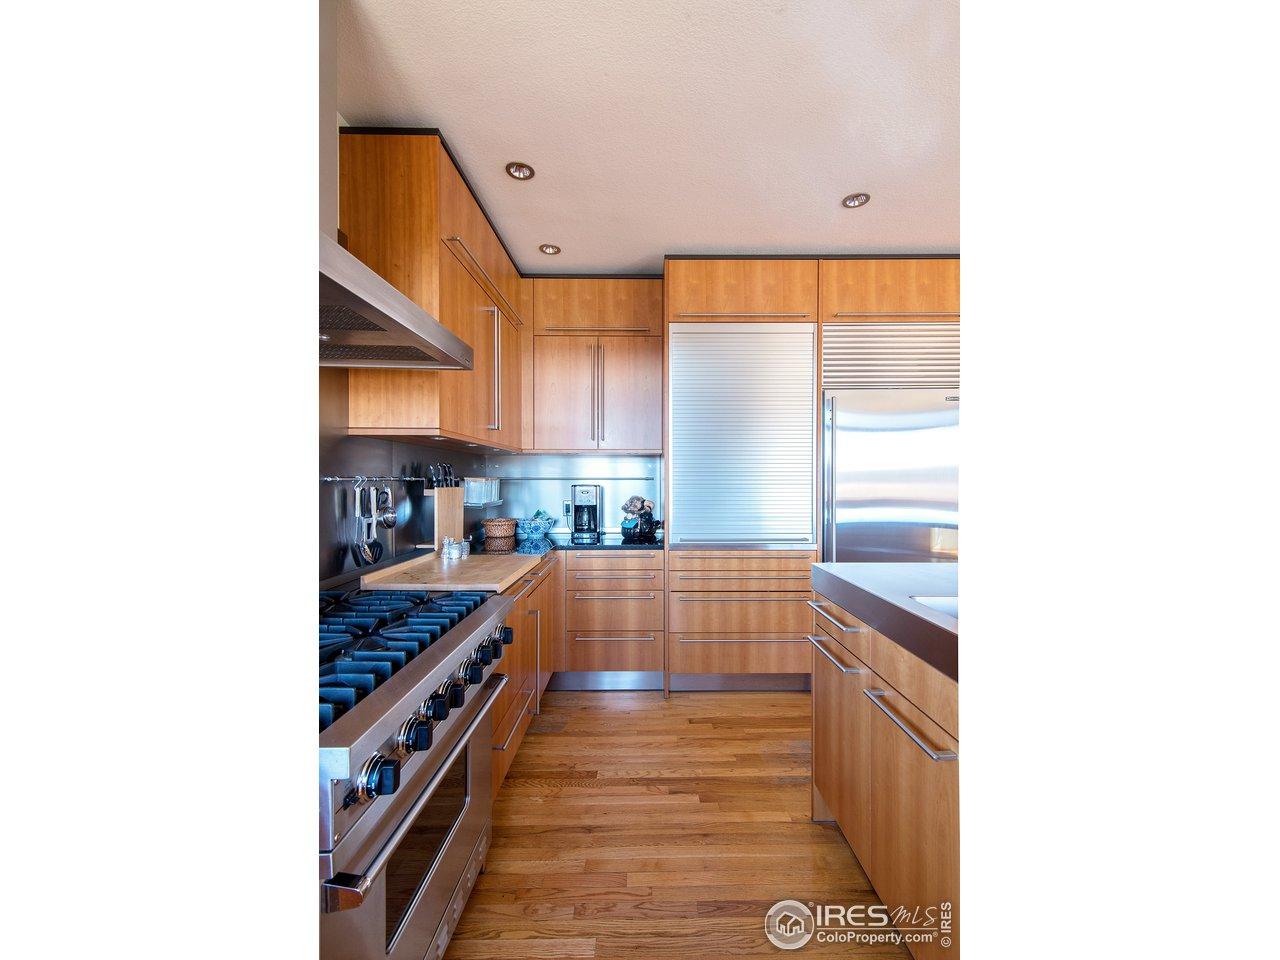 Don't miss the appliance garage